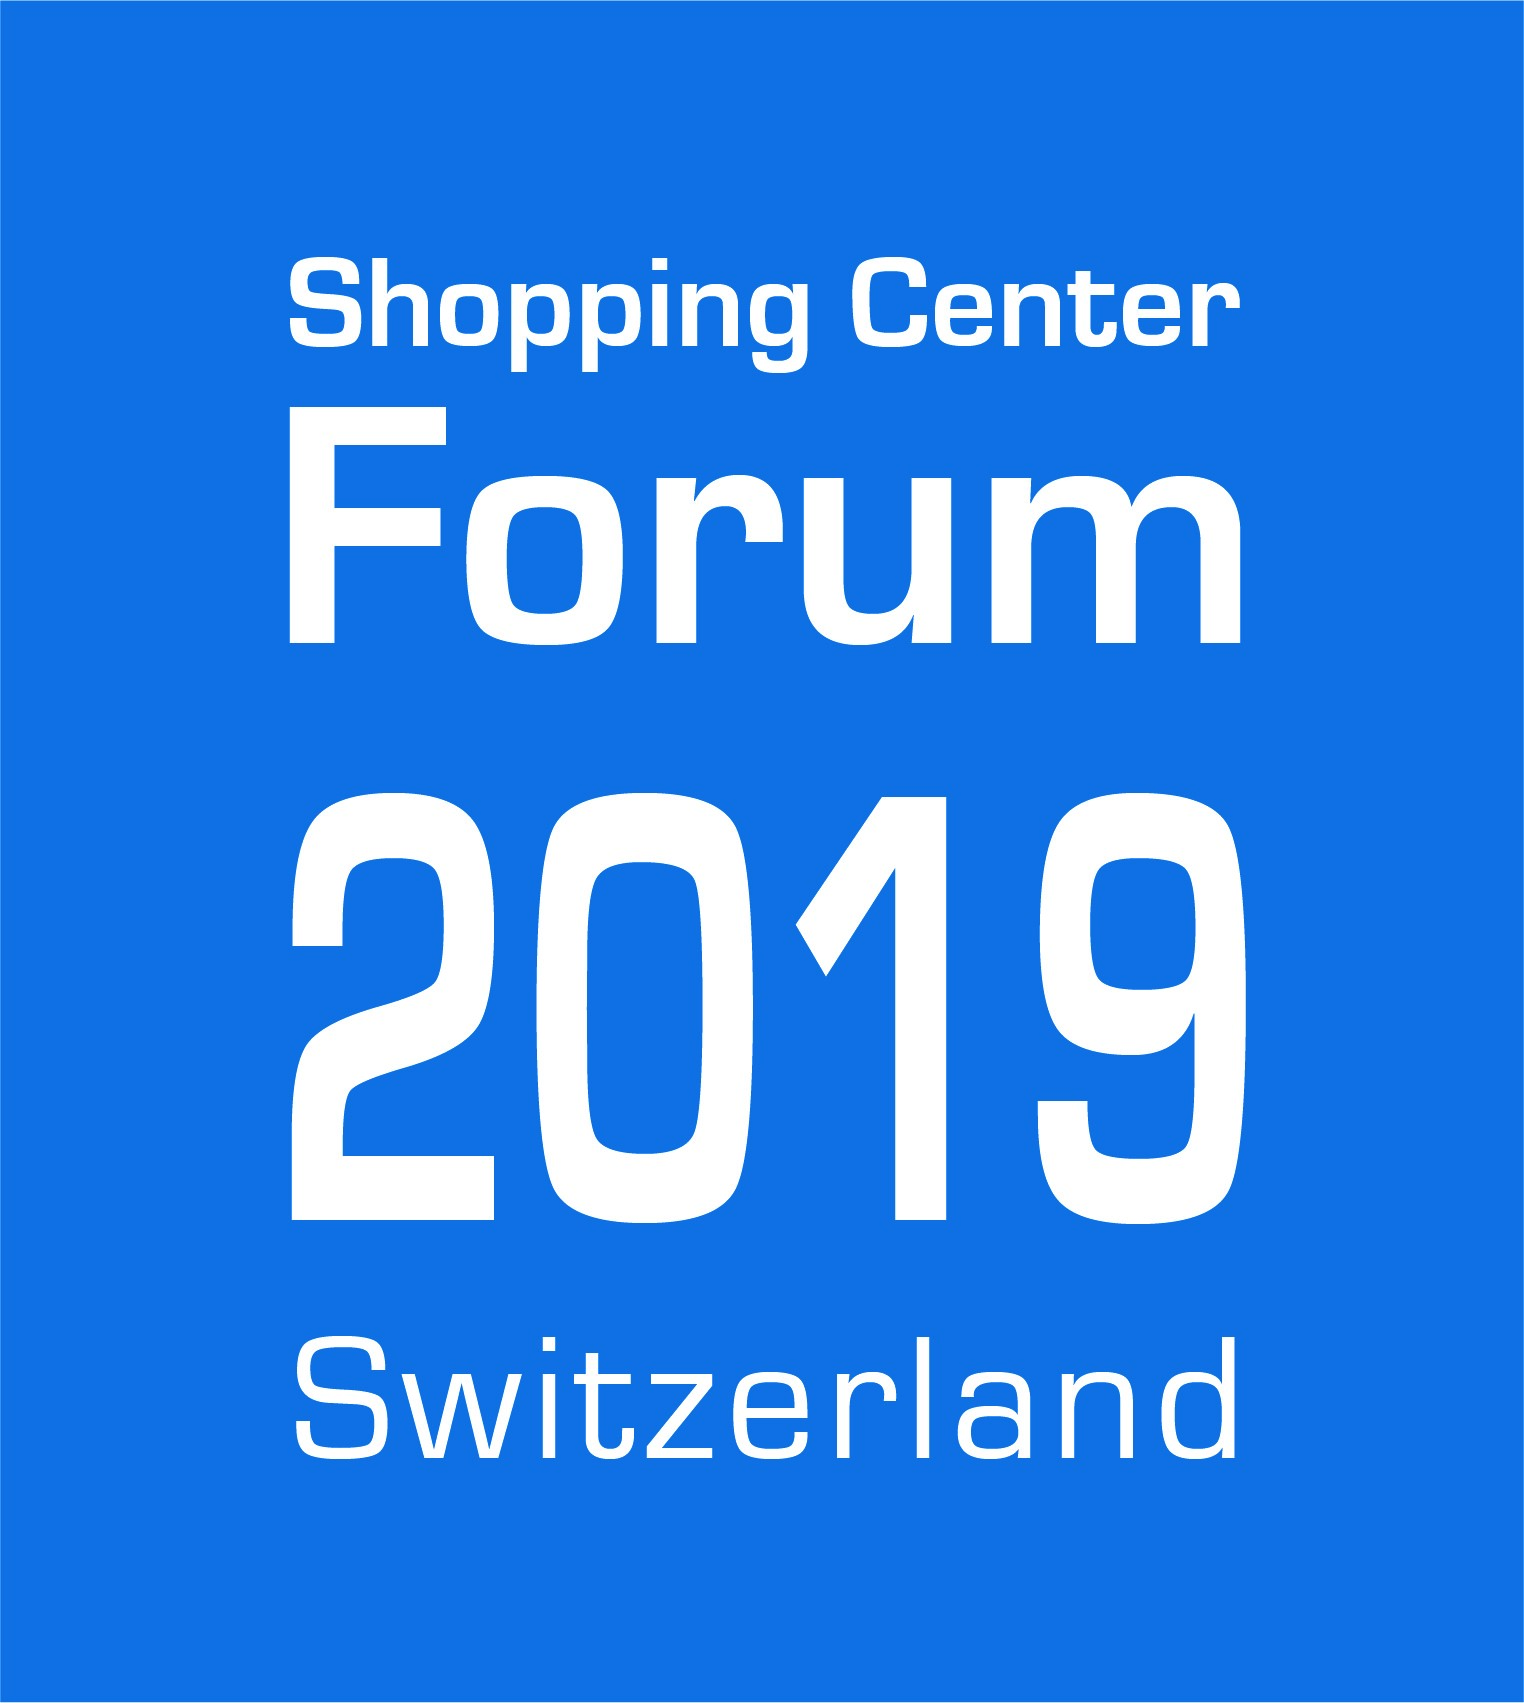 Farner und Shopping Center Forum präsentieren Victor Digital Media Award